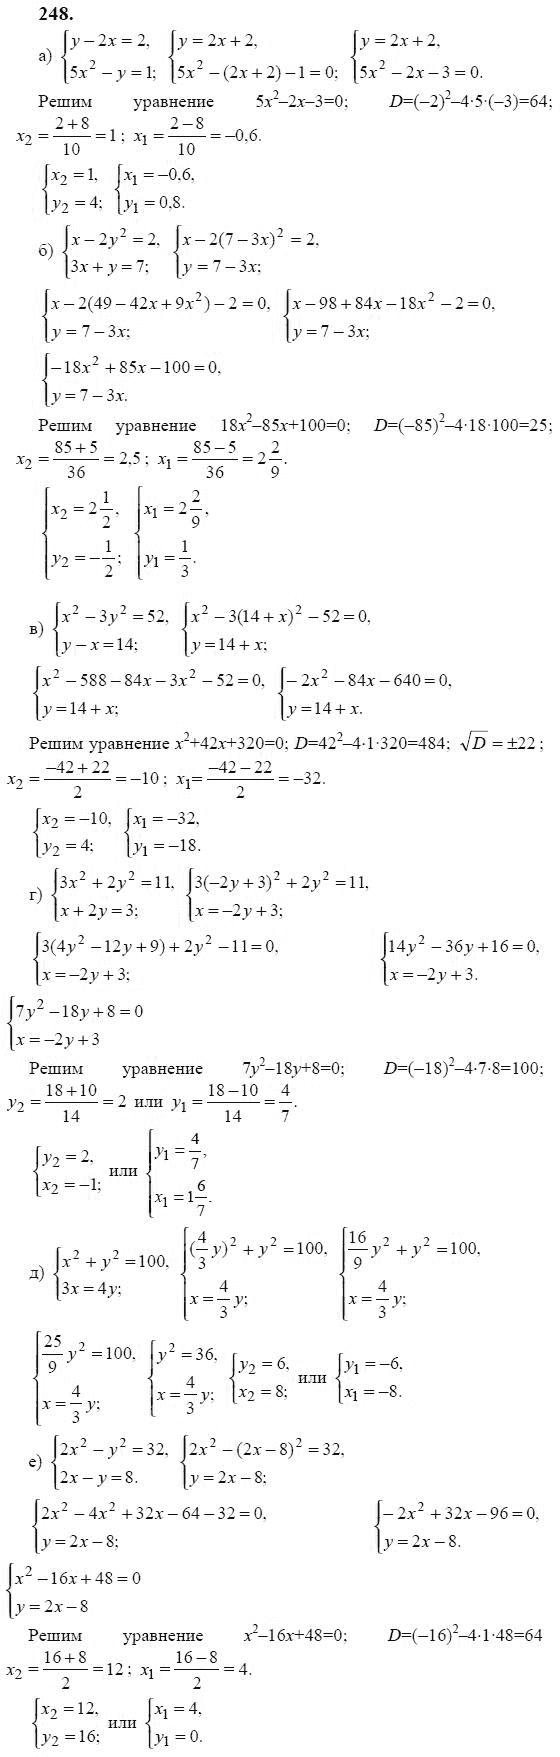 Алгебра 9 Класс Гдз Номер 248